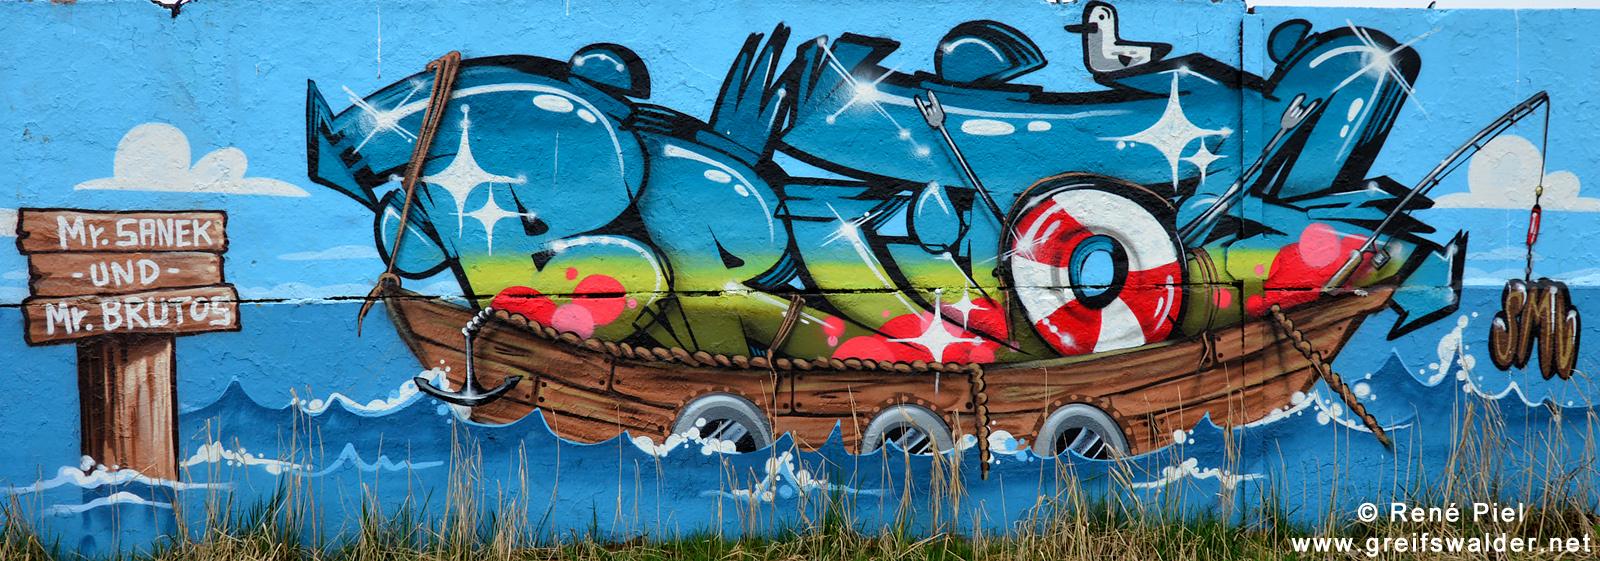 Graffiti Hafenstraße Greifswald